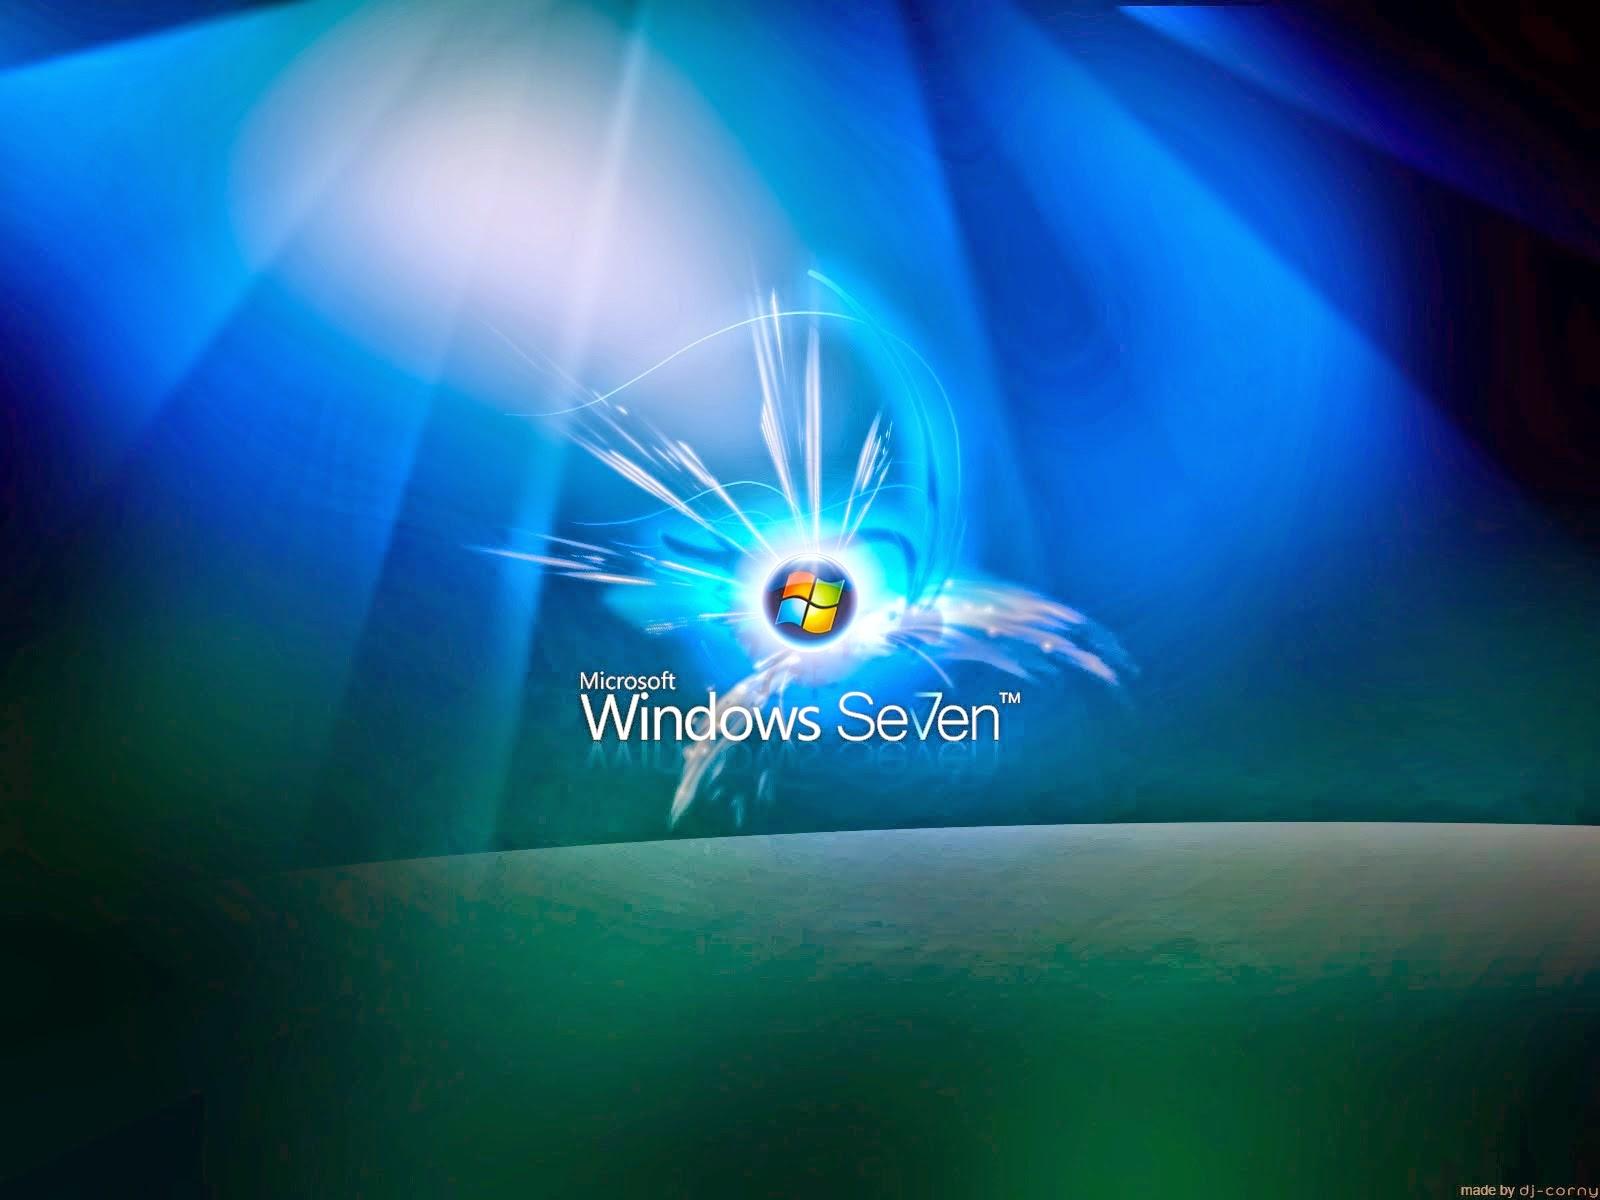 Windows 7 Ultimate 32 Bit And 64 Bit full version